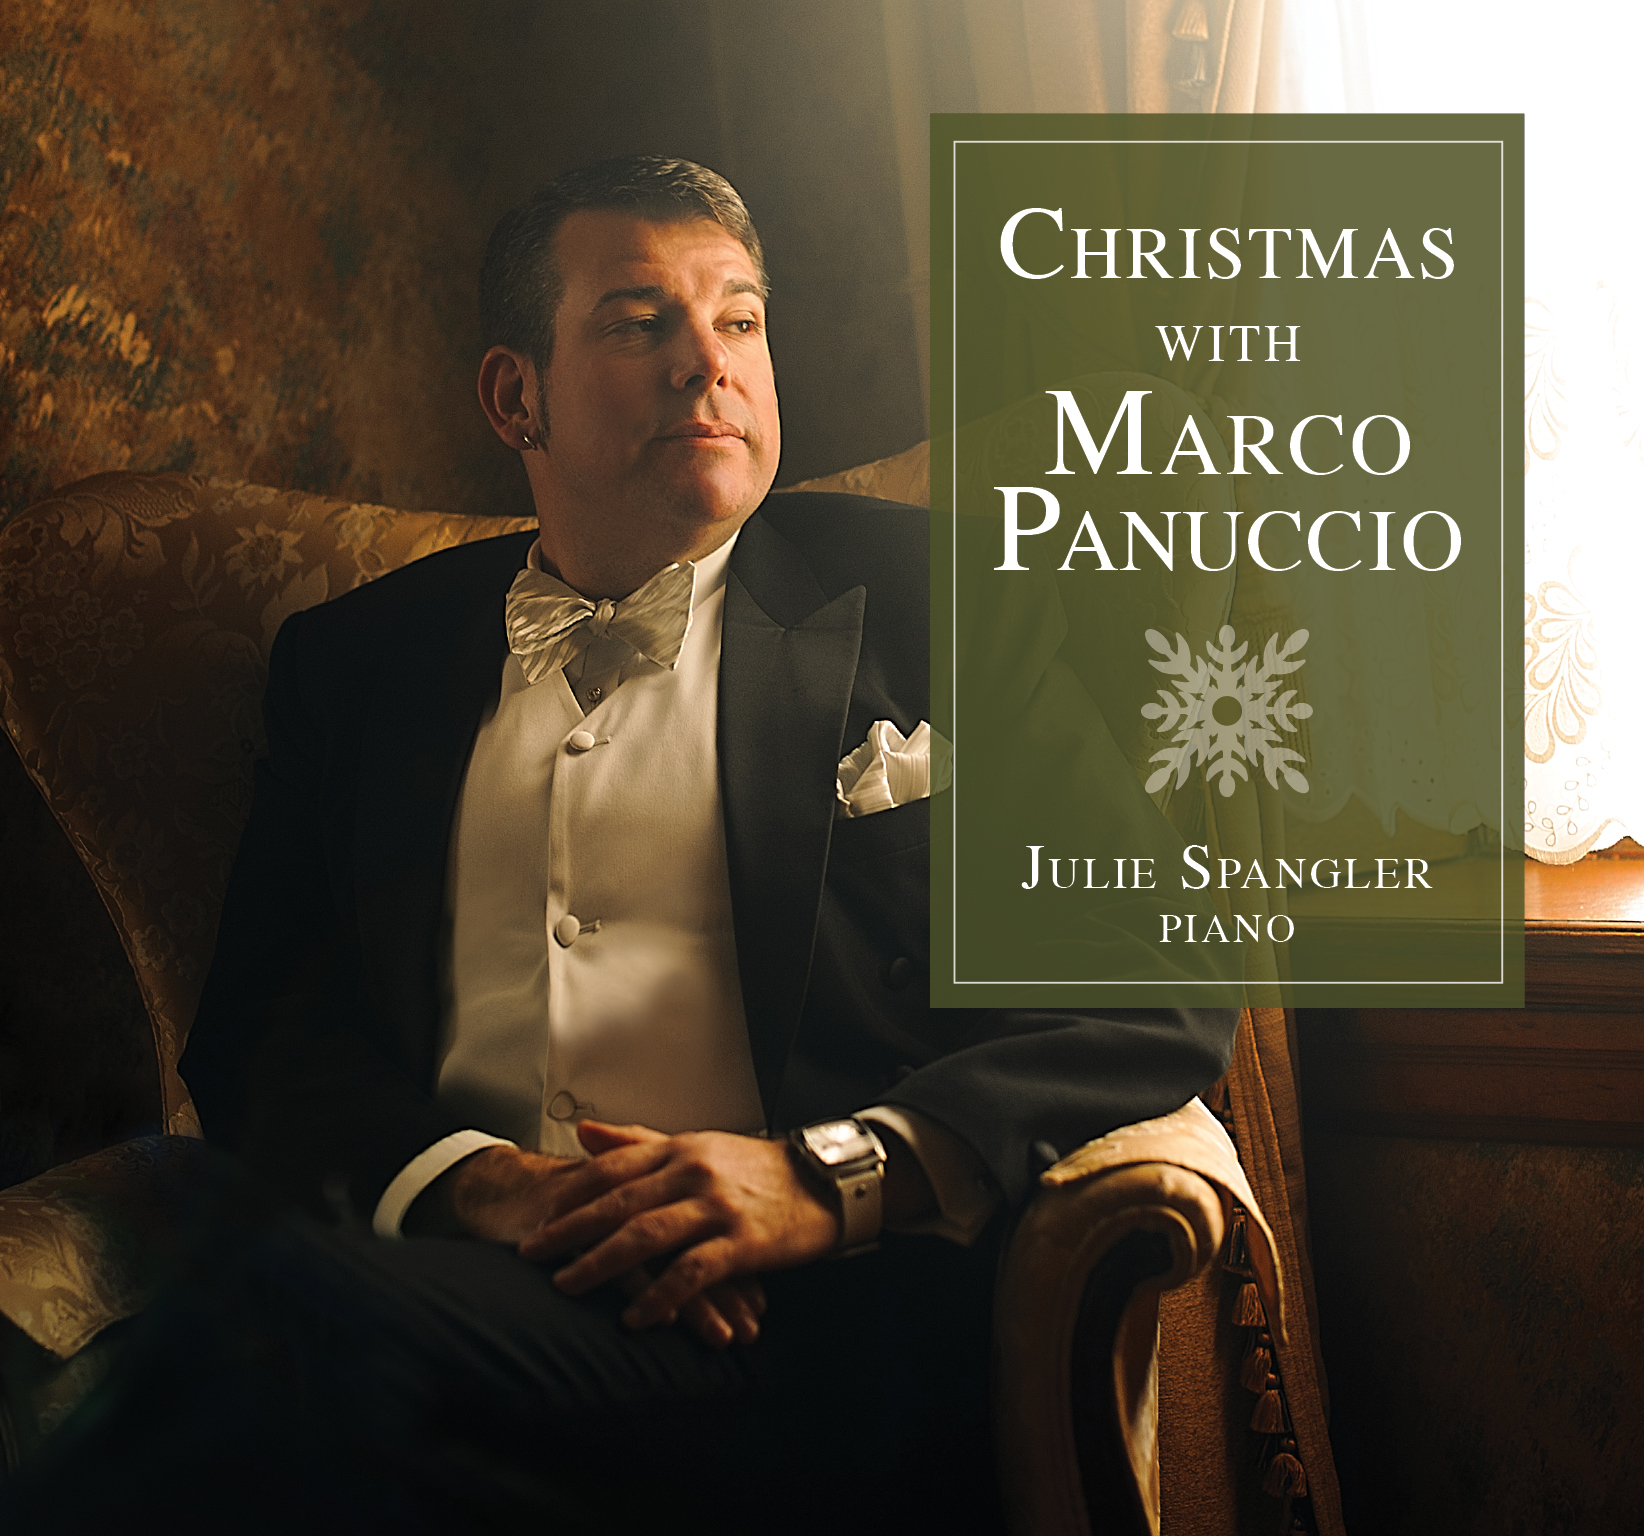 Christmas with Marco Panuccio $19.99